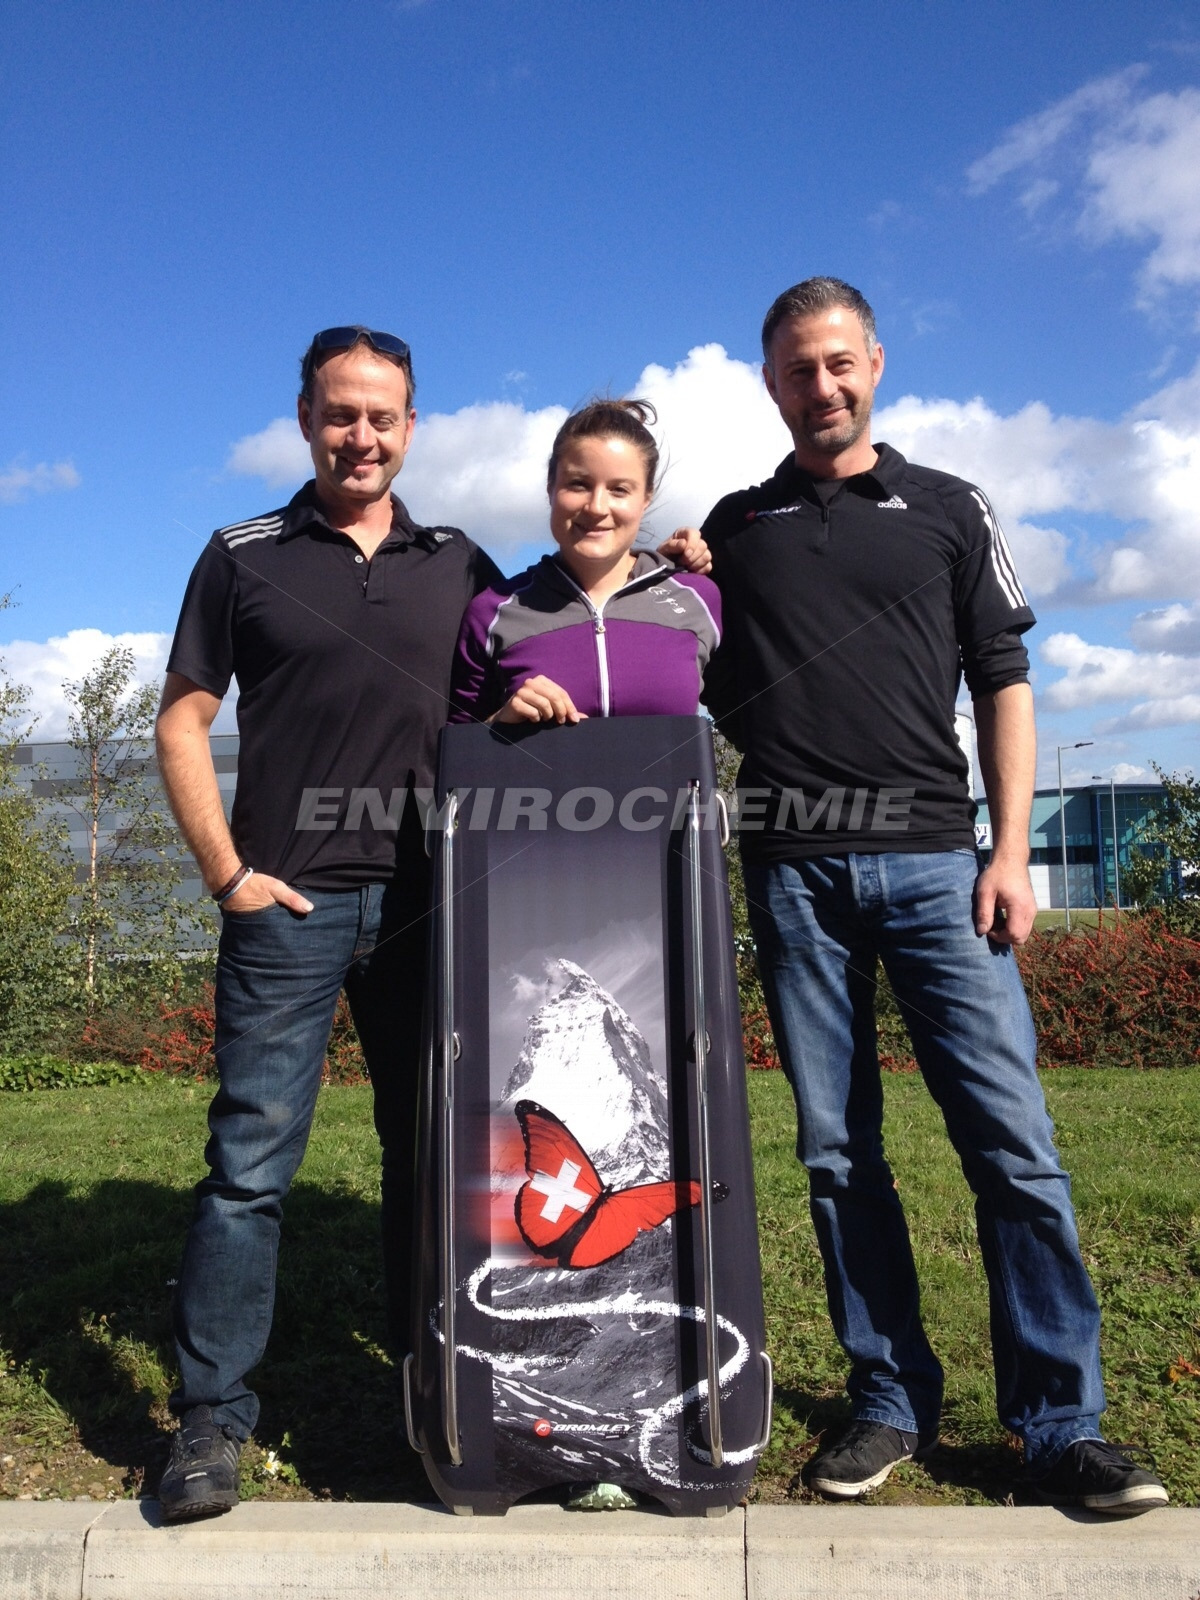 Marina Gilardoni - neuer Rennschlitten made in UK